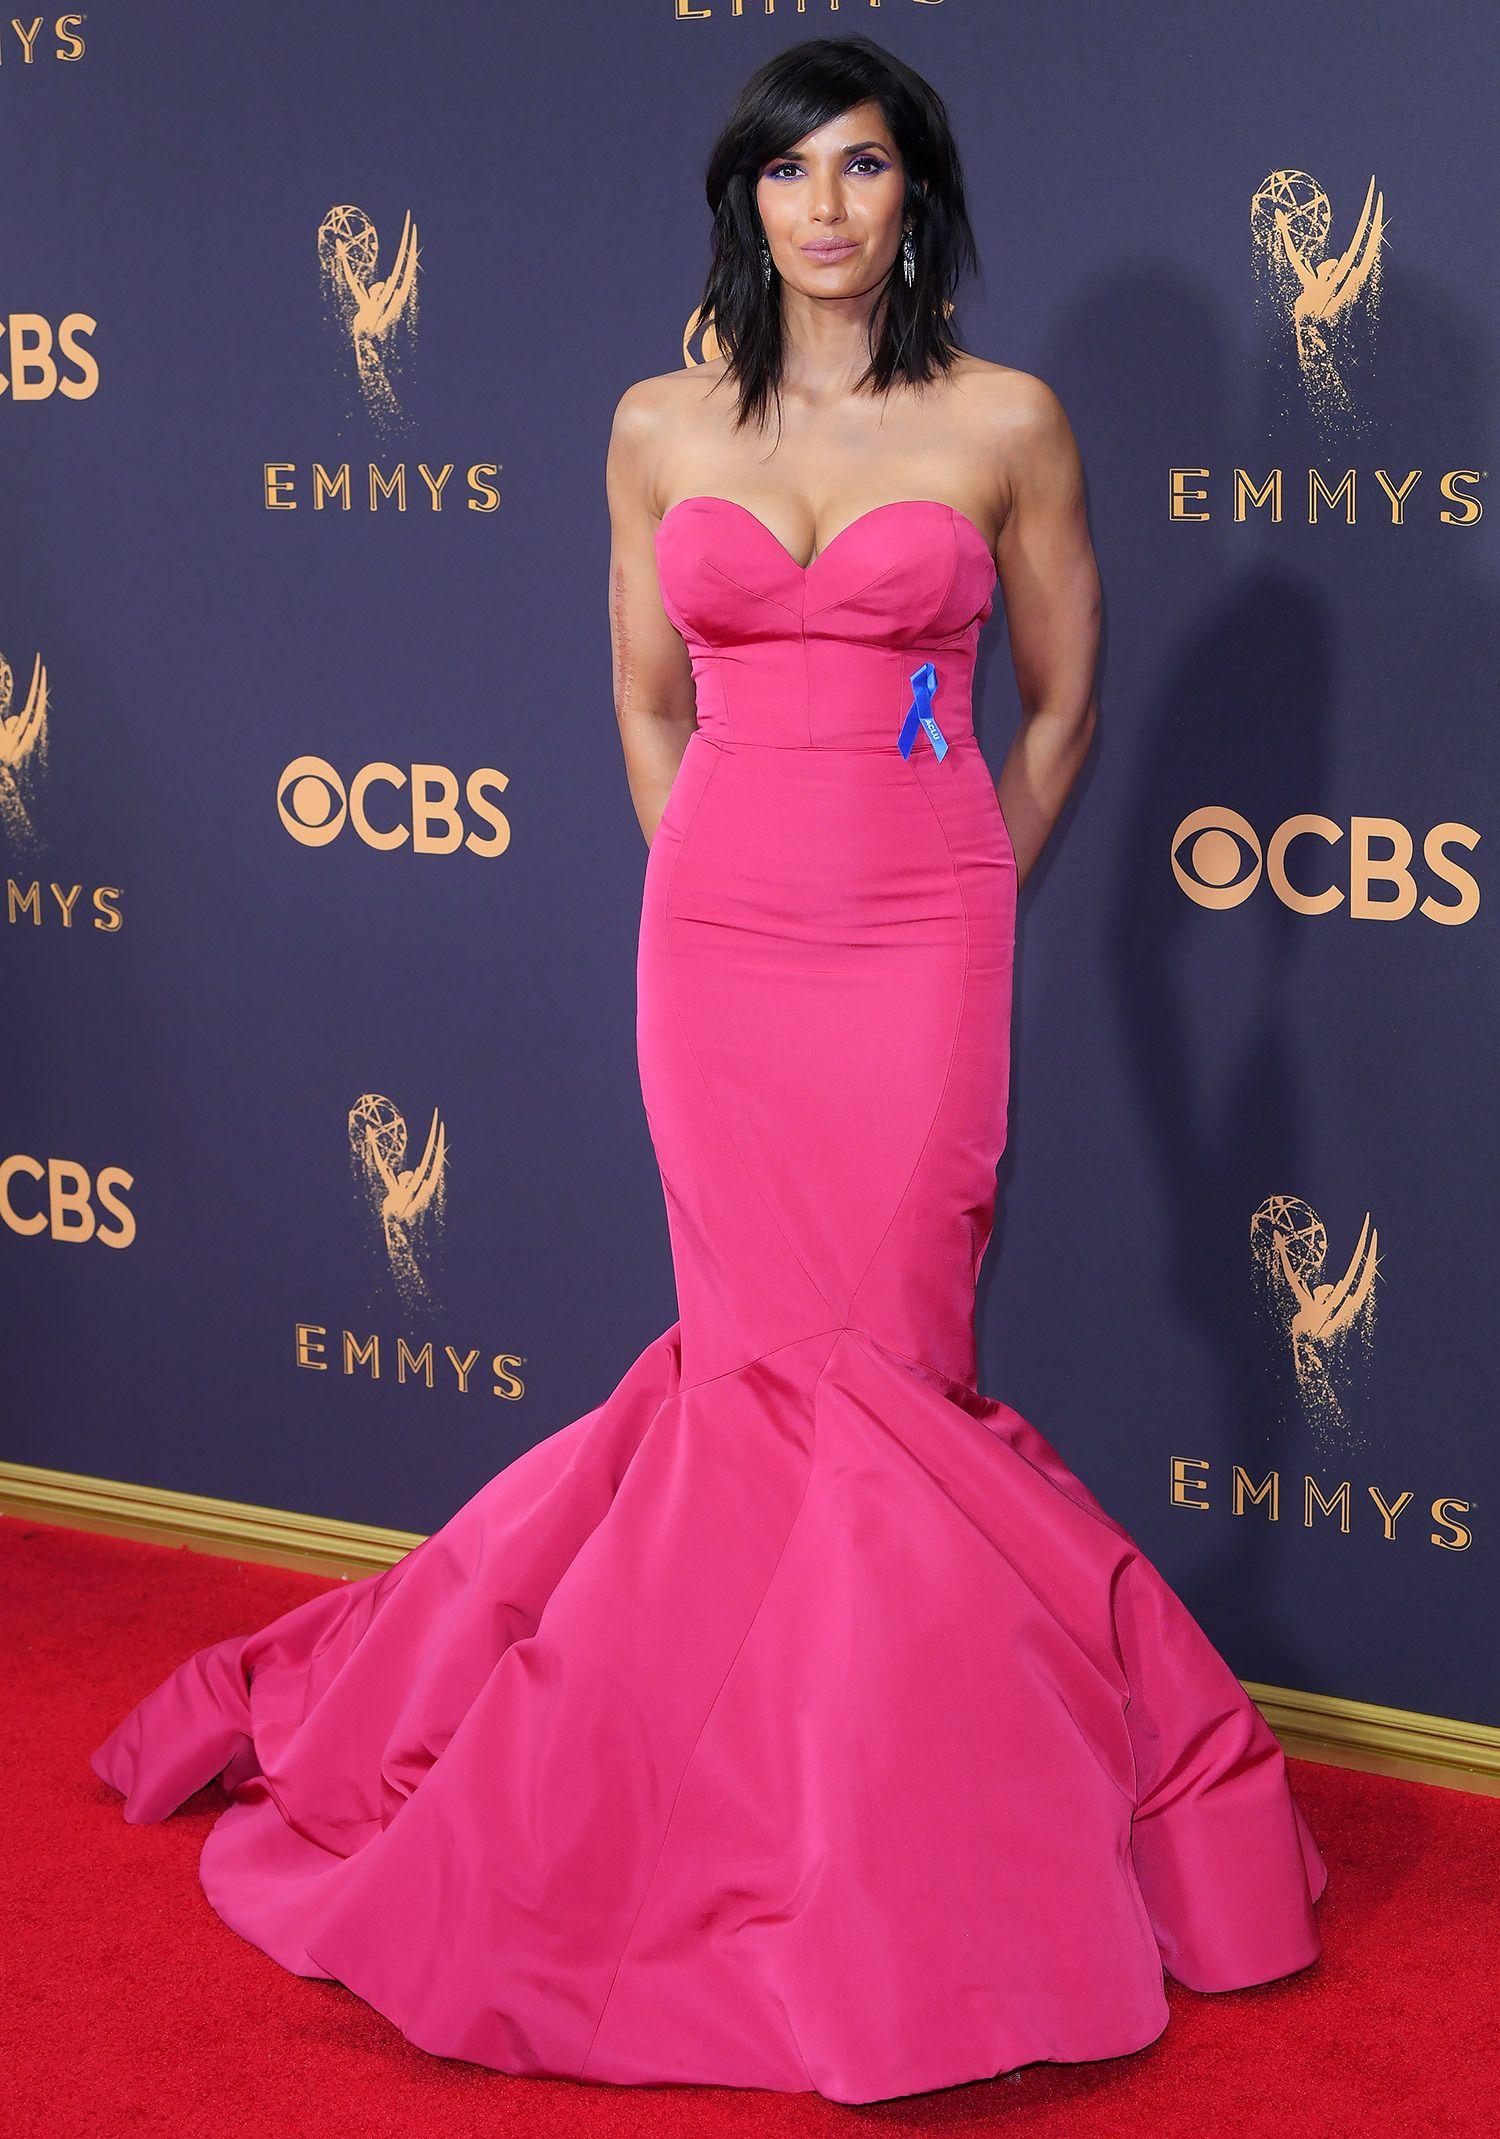 Padma Lakshmi Debuts Drastic New Haircut at the 2017 Emmy Awards